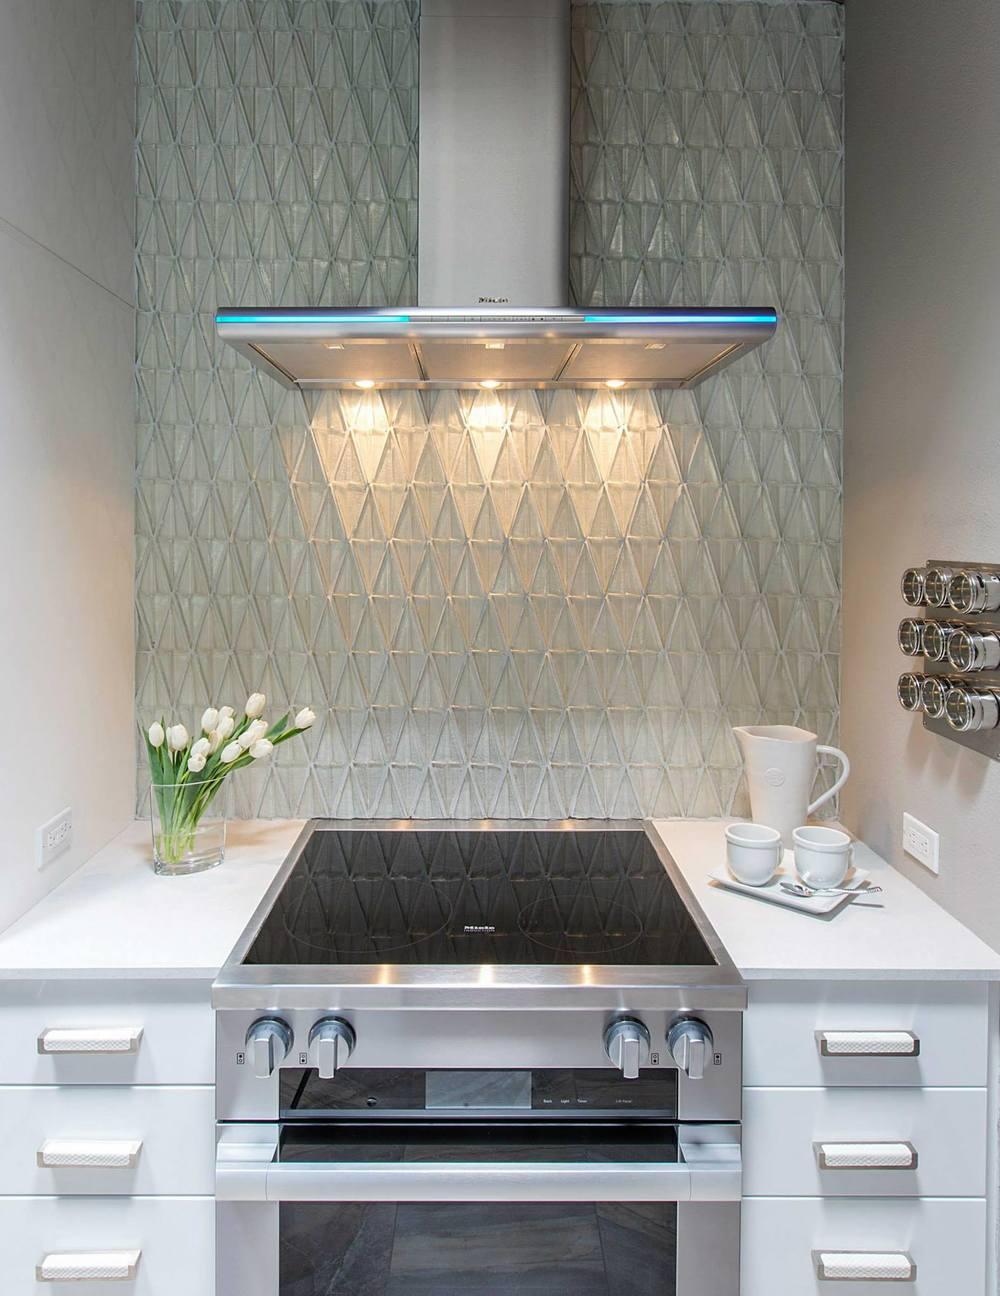 4179987_4_Statements_tile_Kitchen_glass_backsplash.jpg